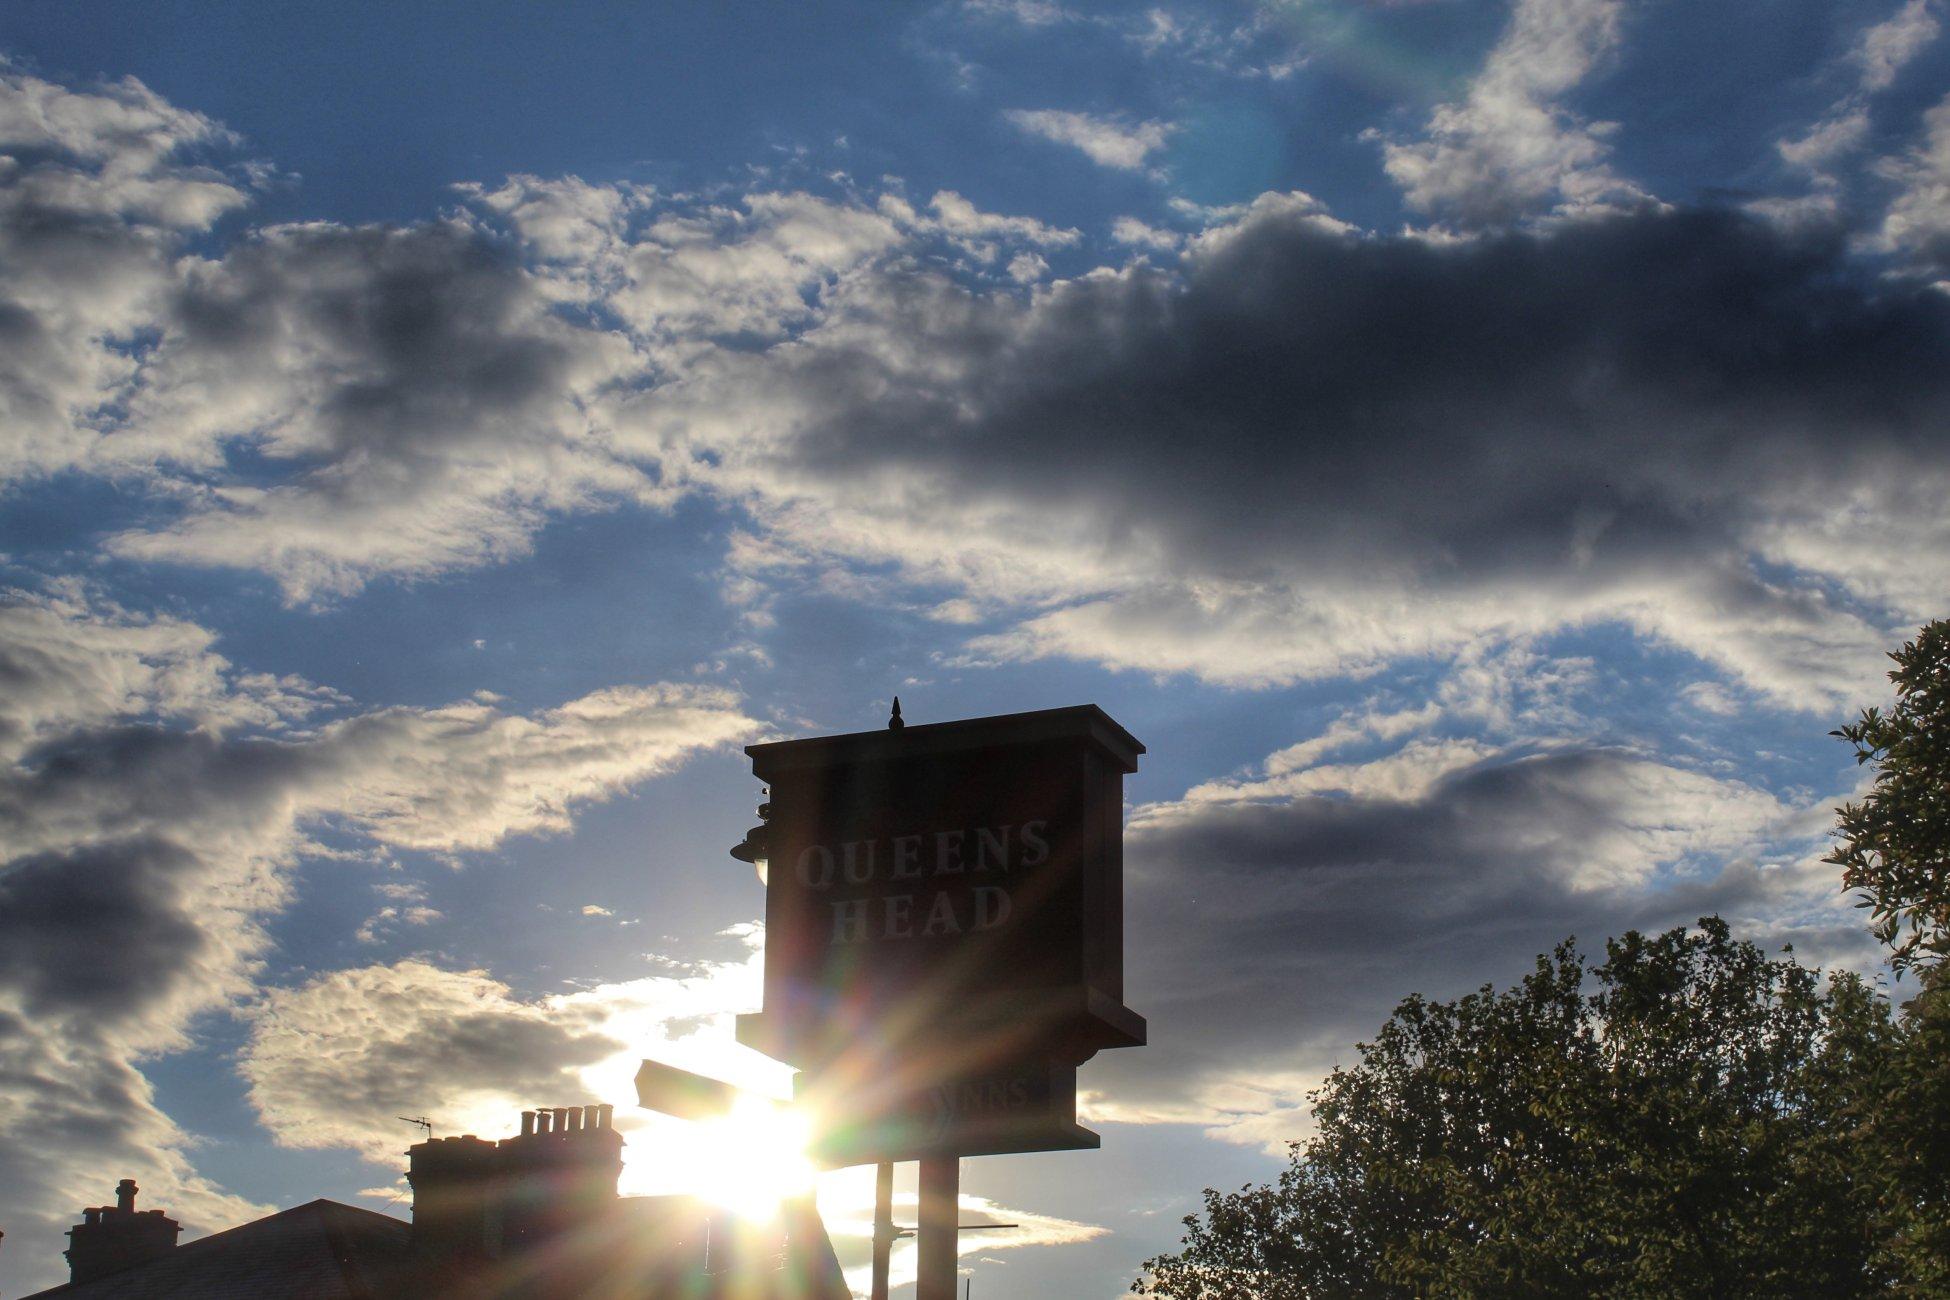 Sunset behind a sign